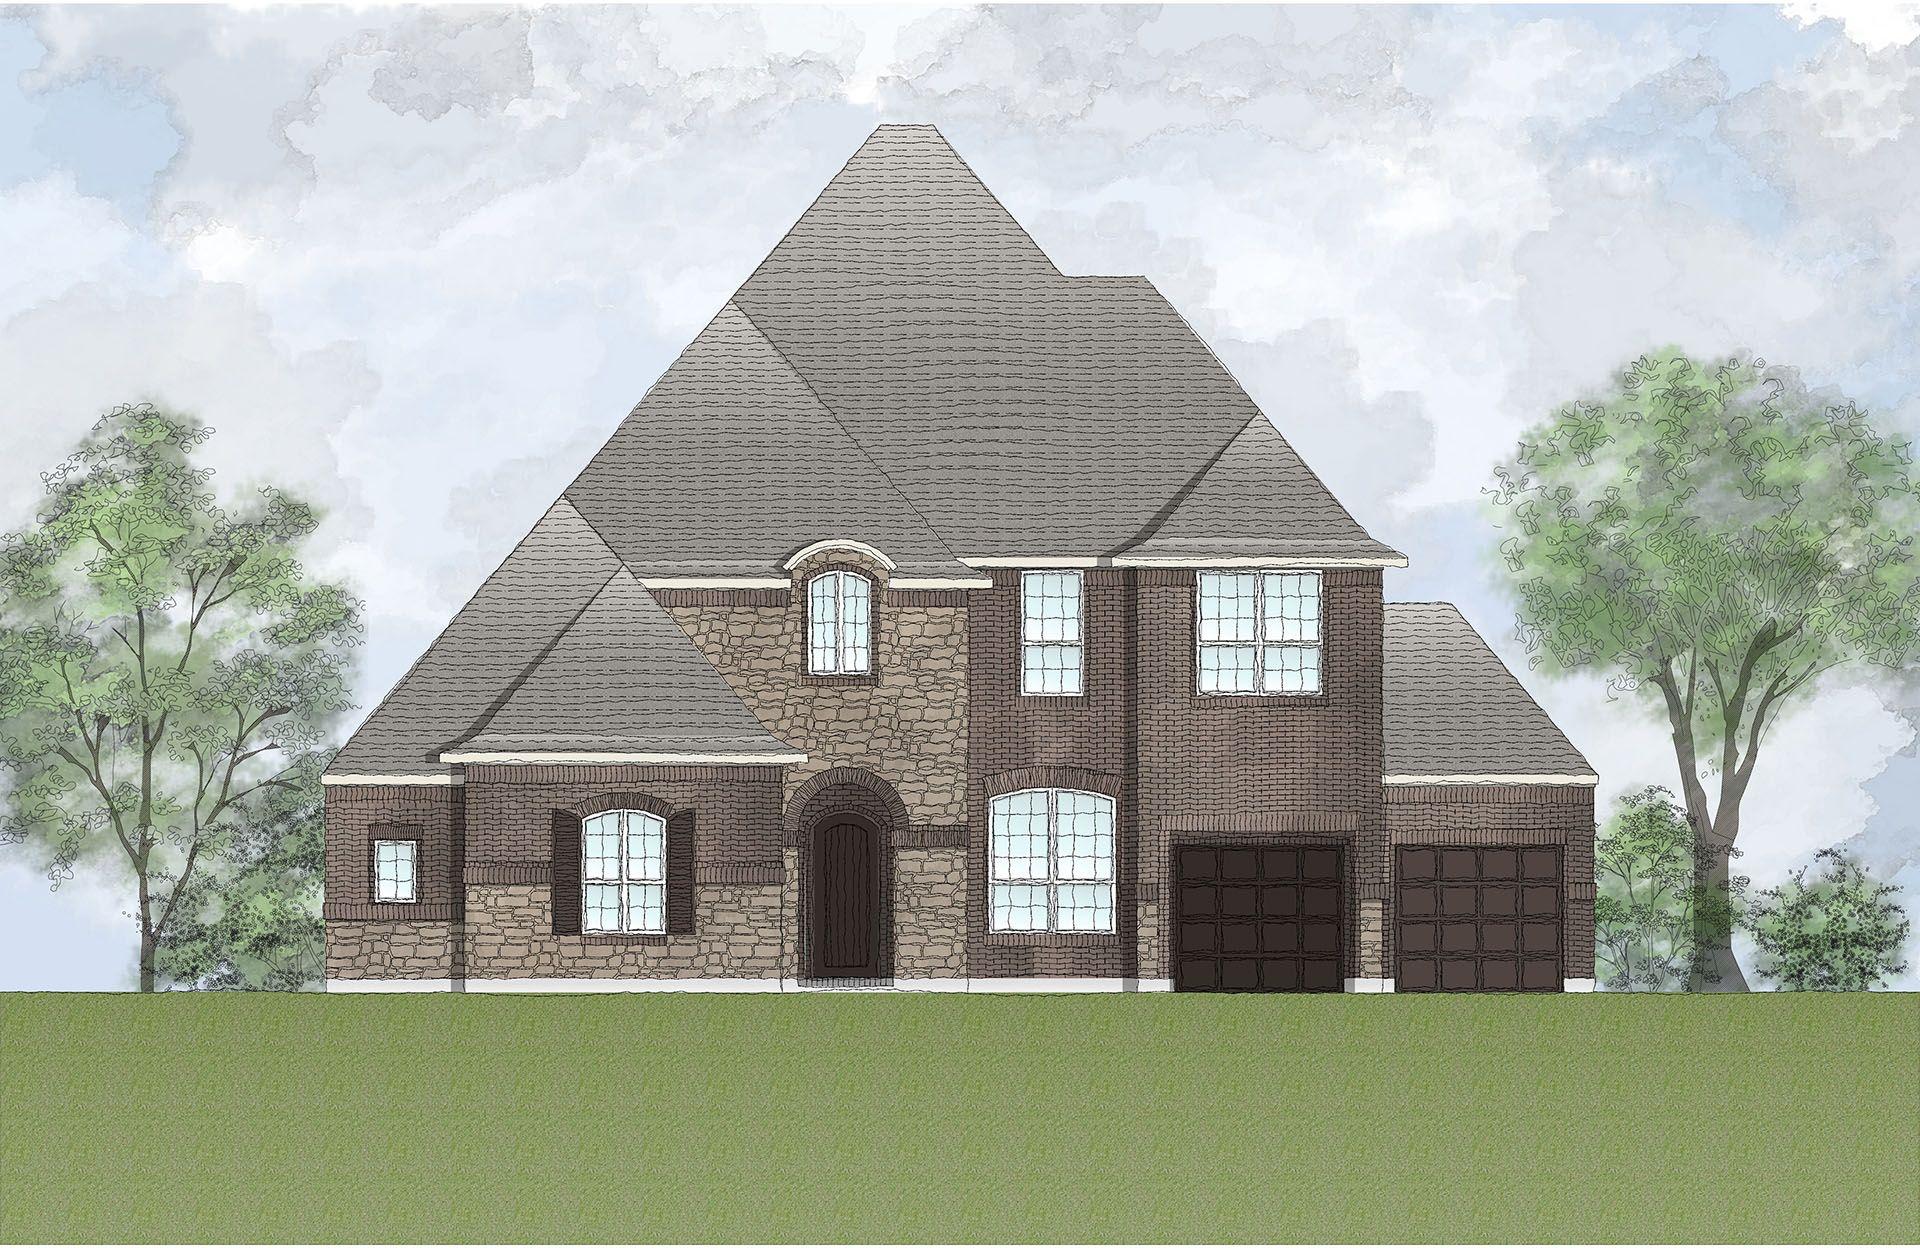 Single Family for Sale at Royal Brook At Kingwood - Riviera 3306 Lockridge Harbor Lane Porter, Texas 77365 United States